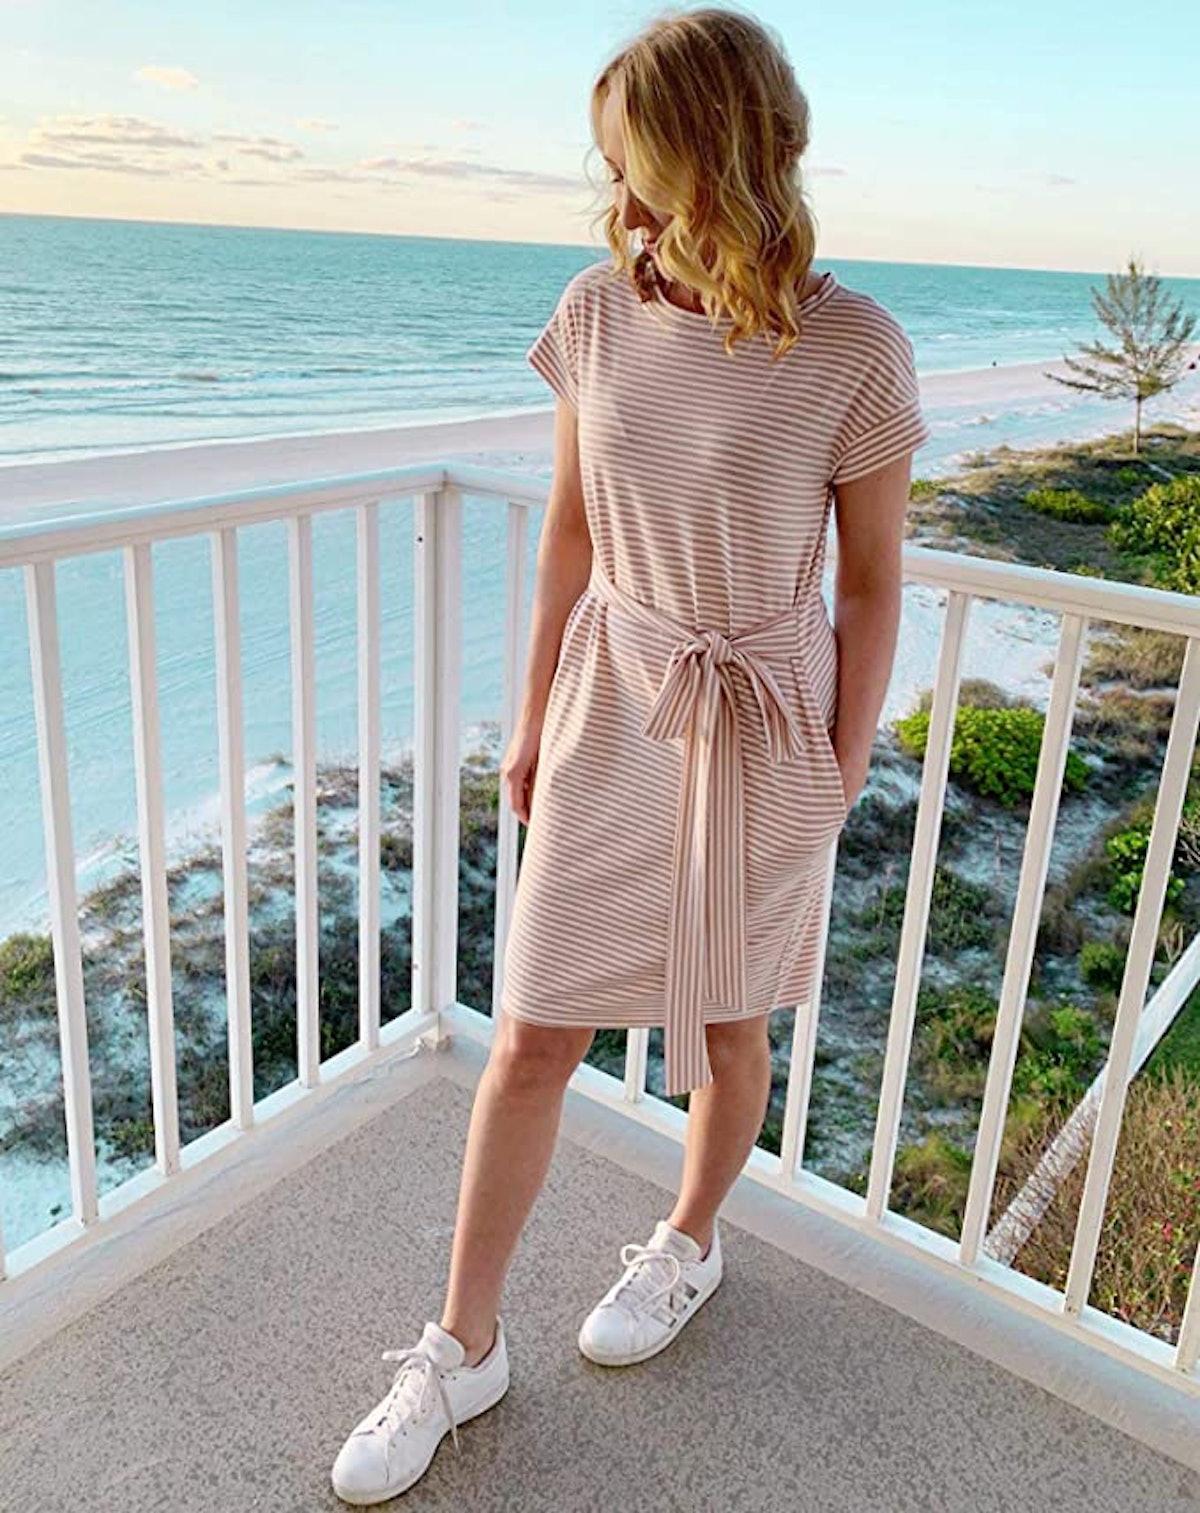 MEROKEETY Striped Short Sleeve T Shirt Dress with Pockets